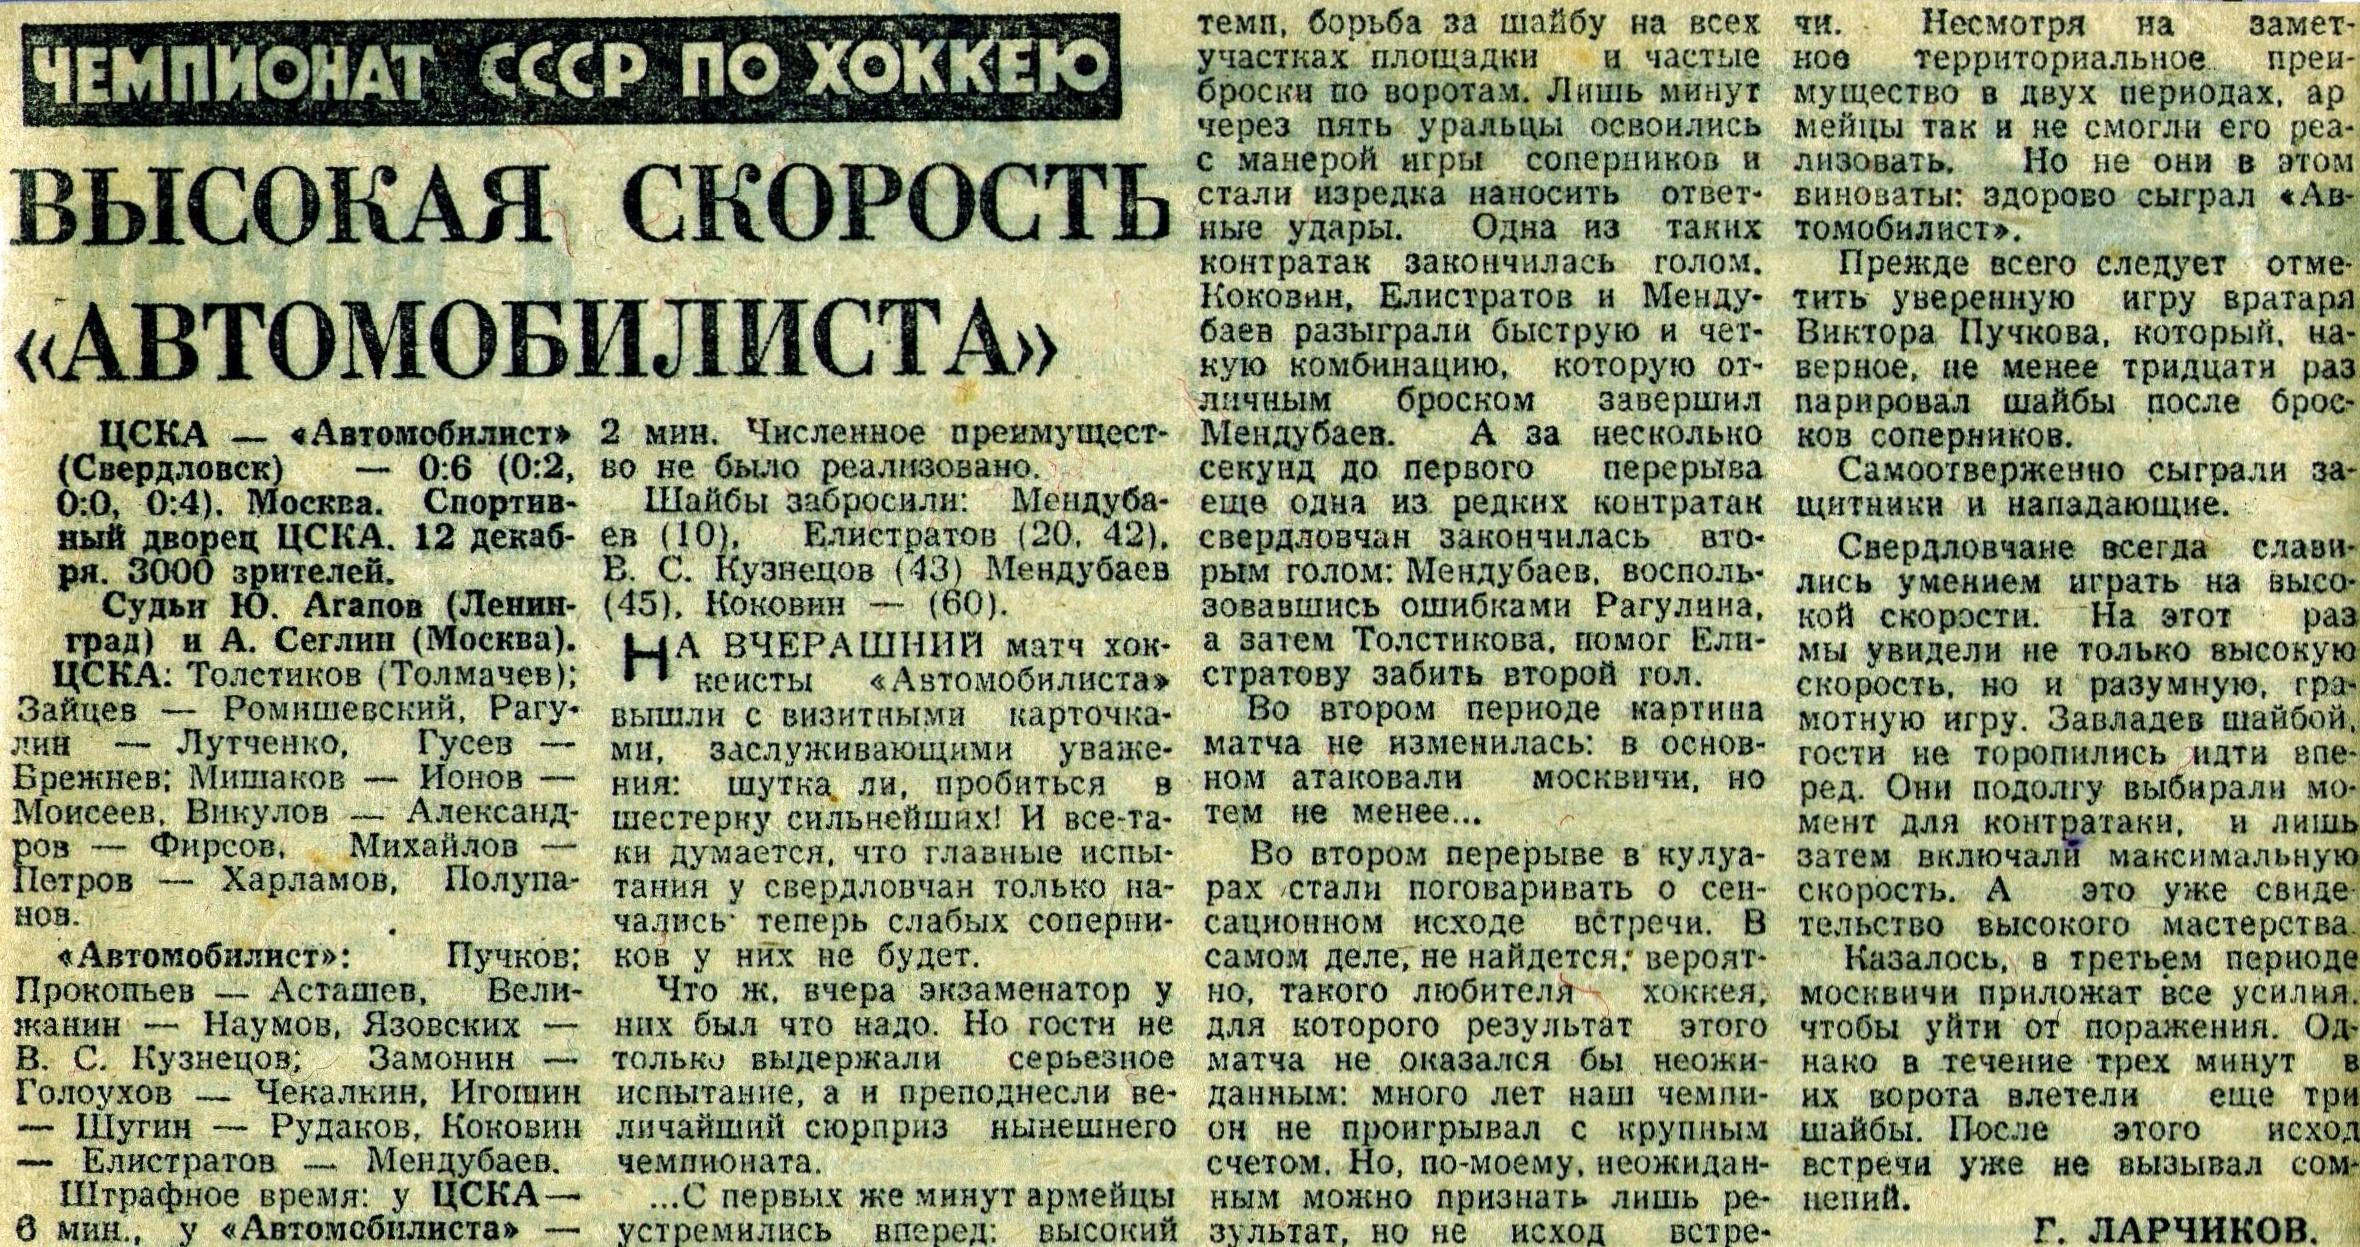 1968.12.12 ЦСКА 0-6 Автомобилист Св..jpg